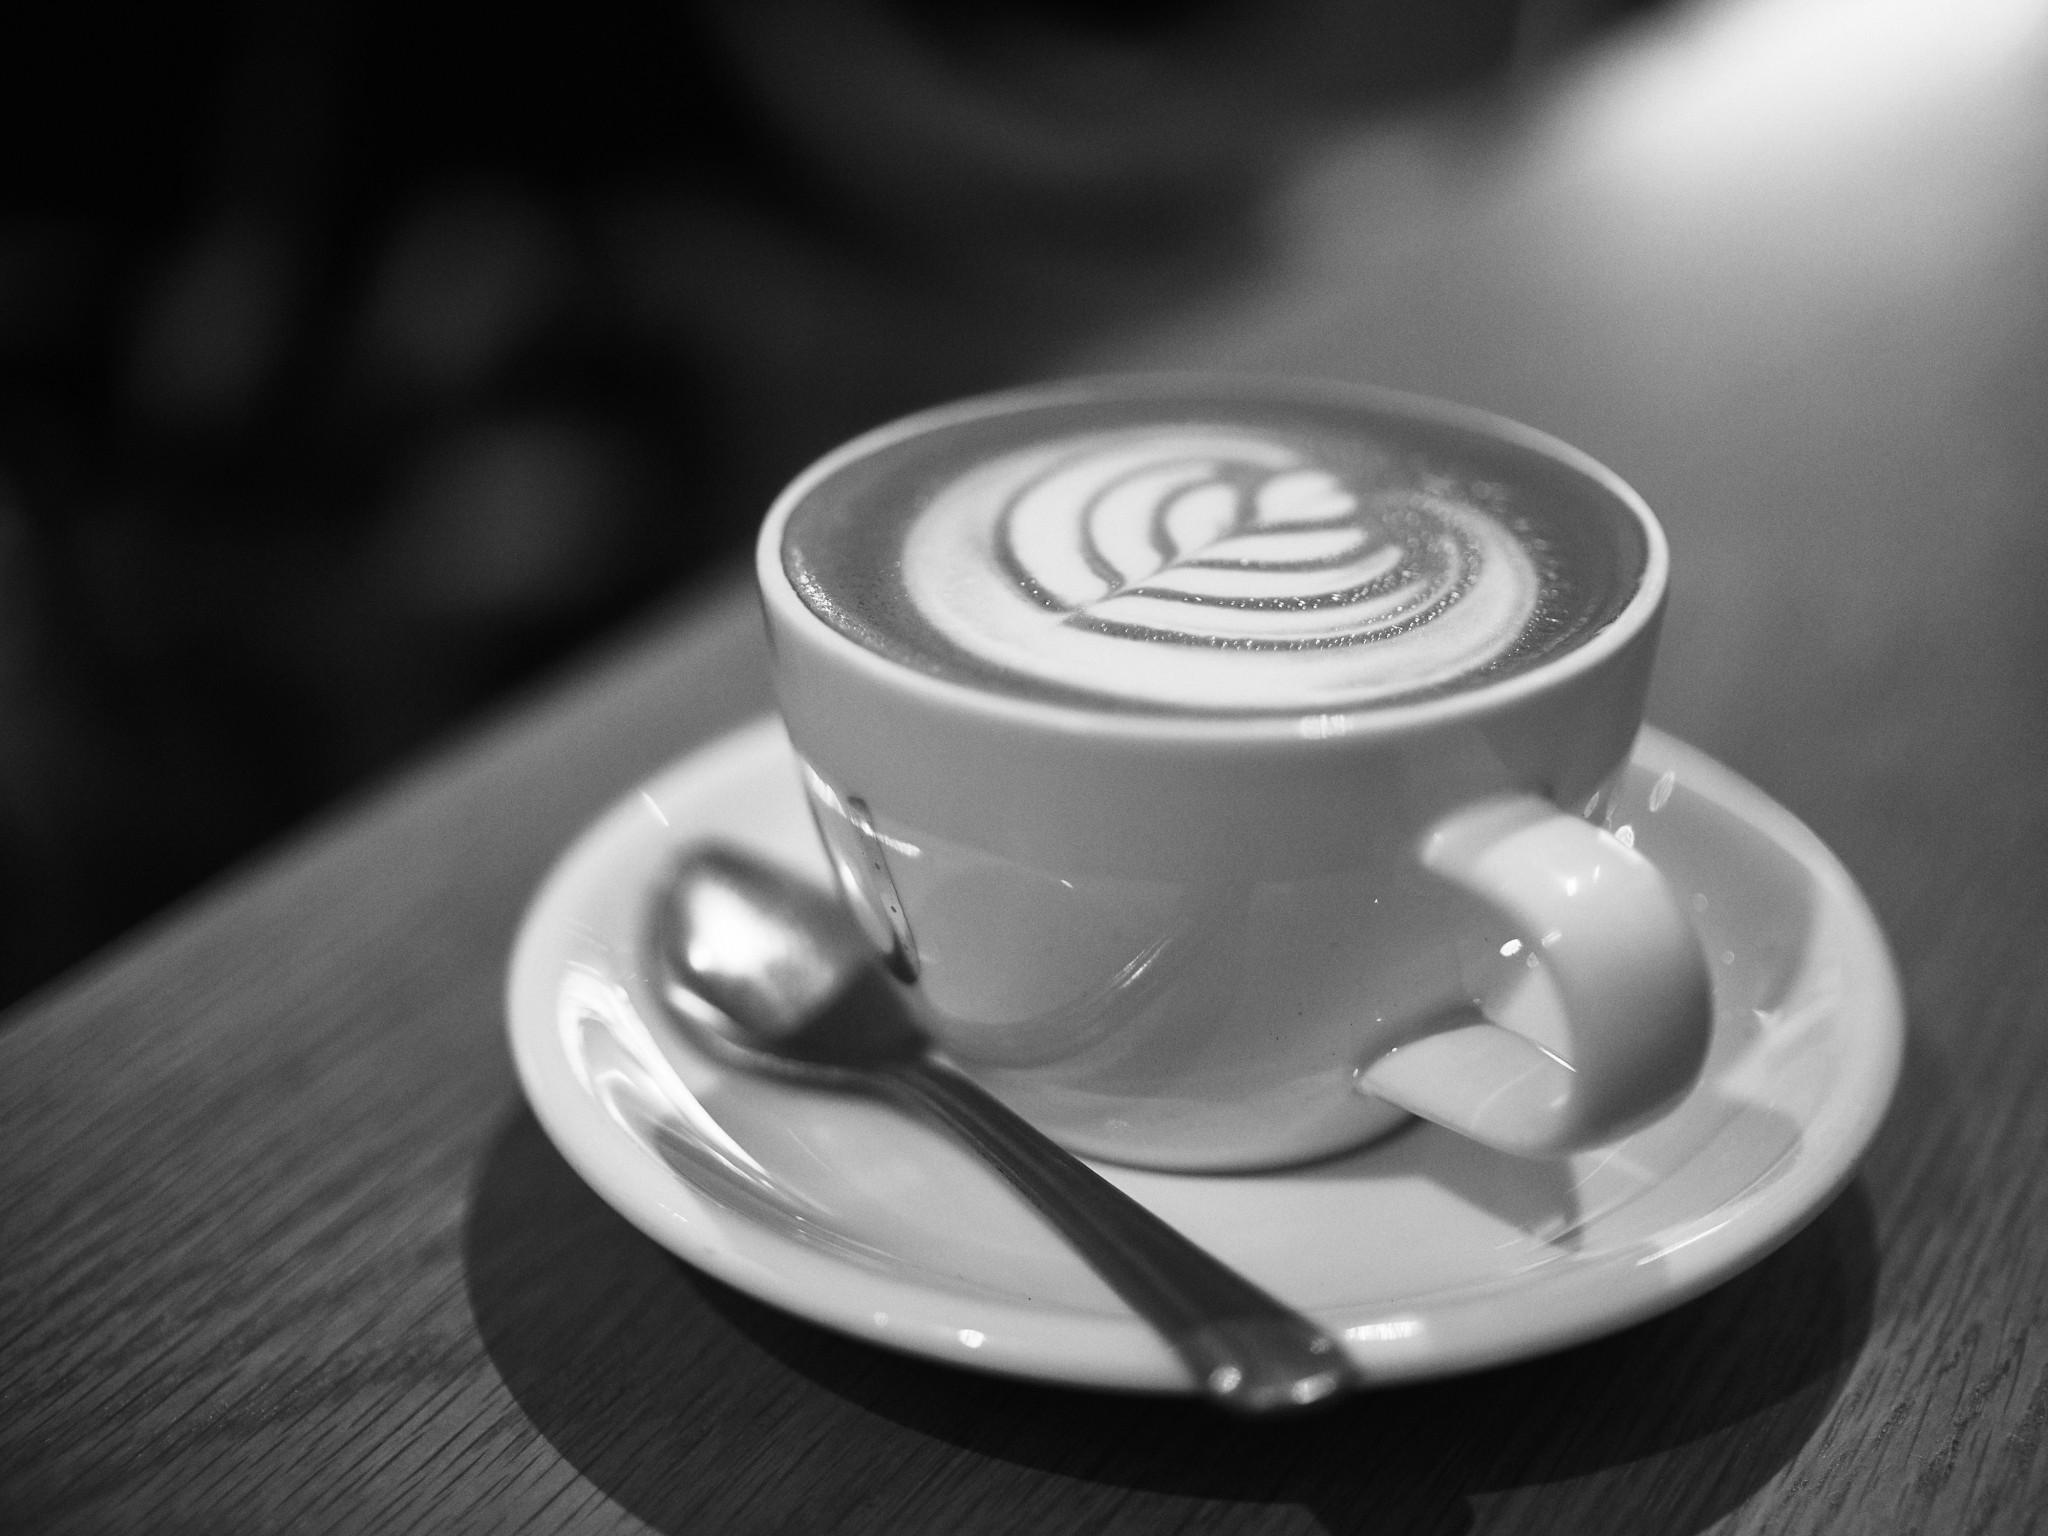 07-Cappuccino.jpg